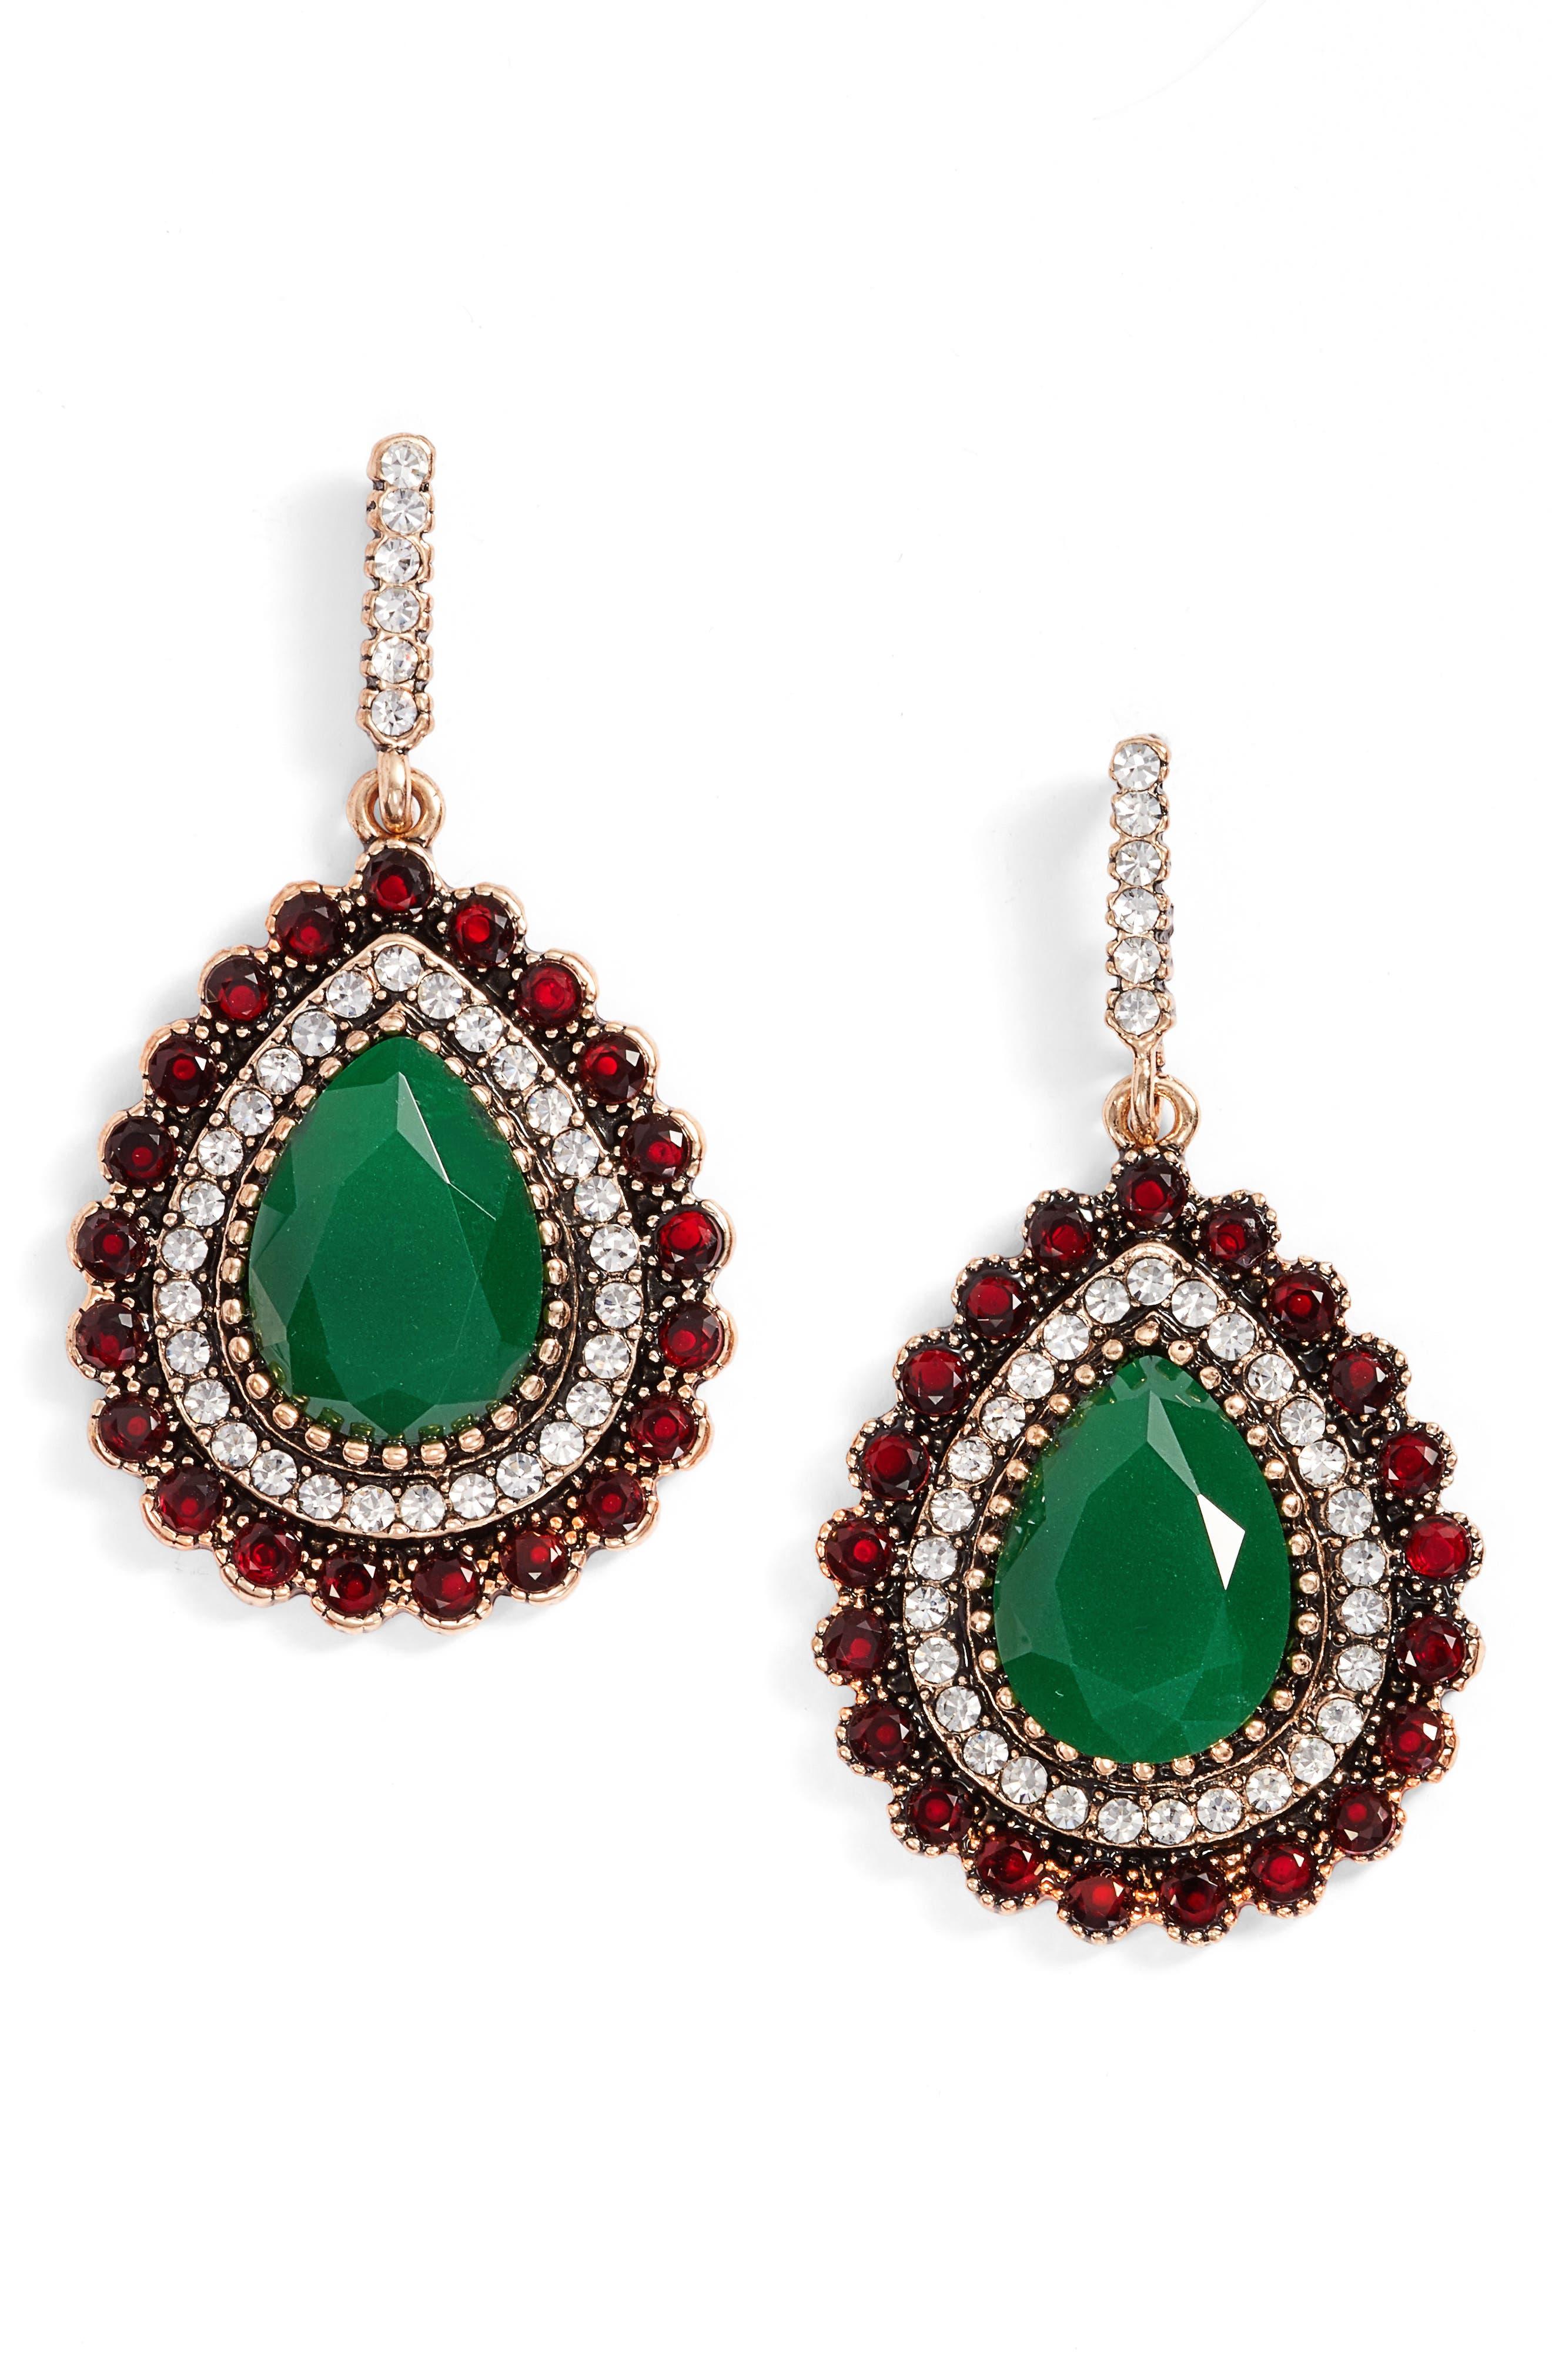 Lily Teardrop Earrings,                             Main thumbnail 1, color,                             300